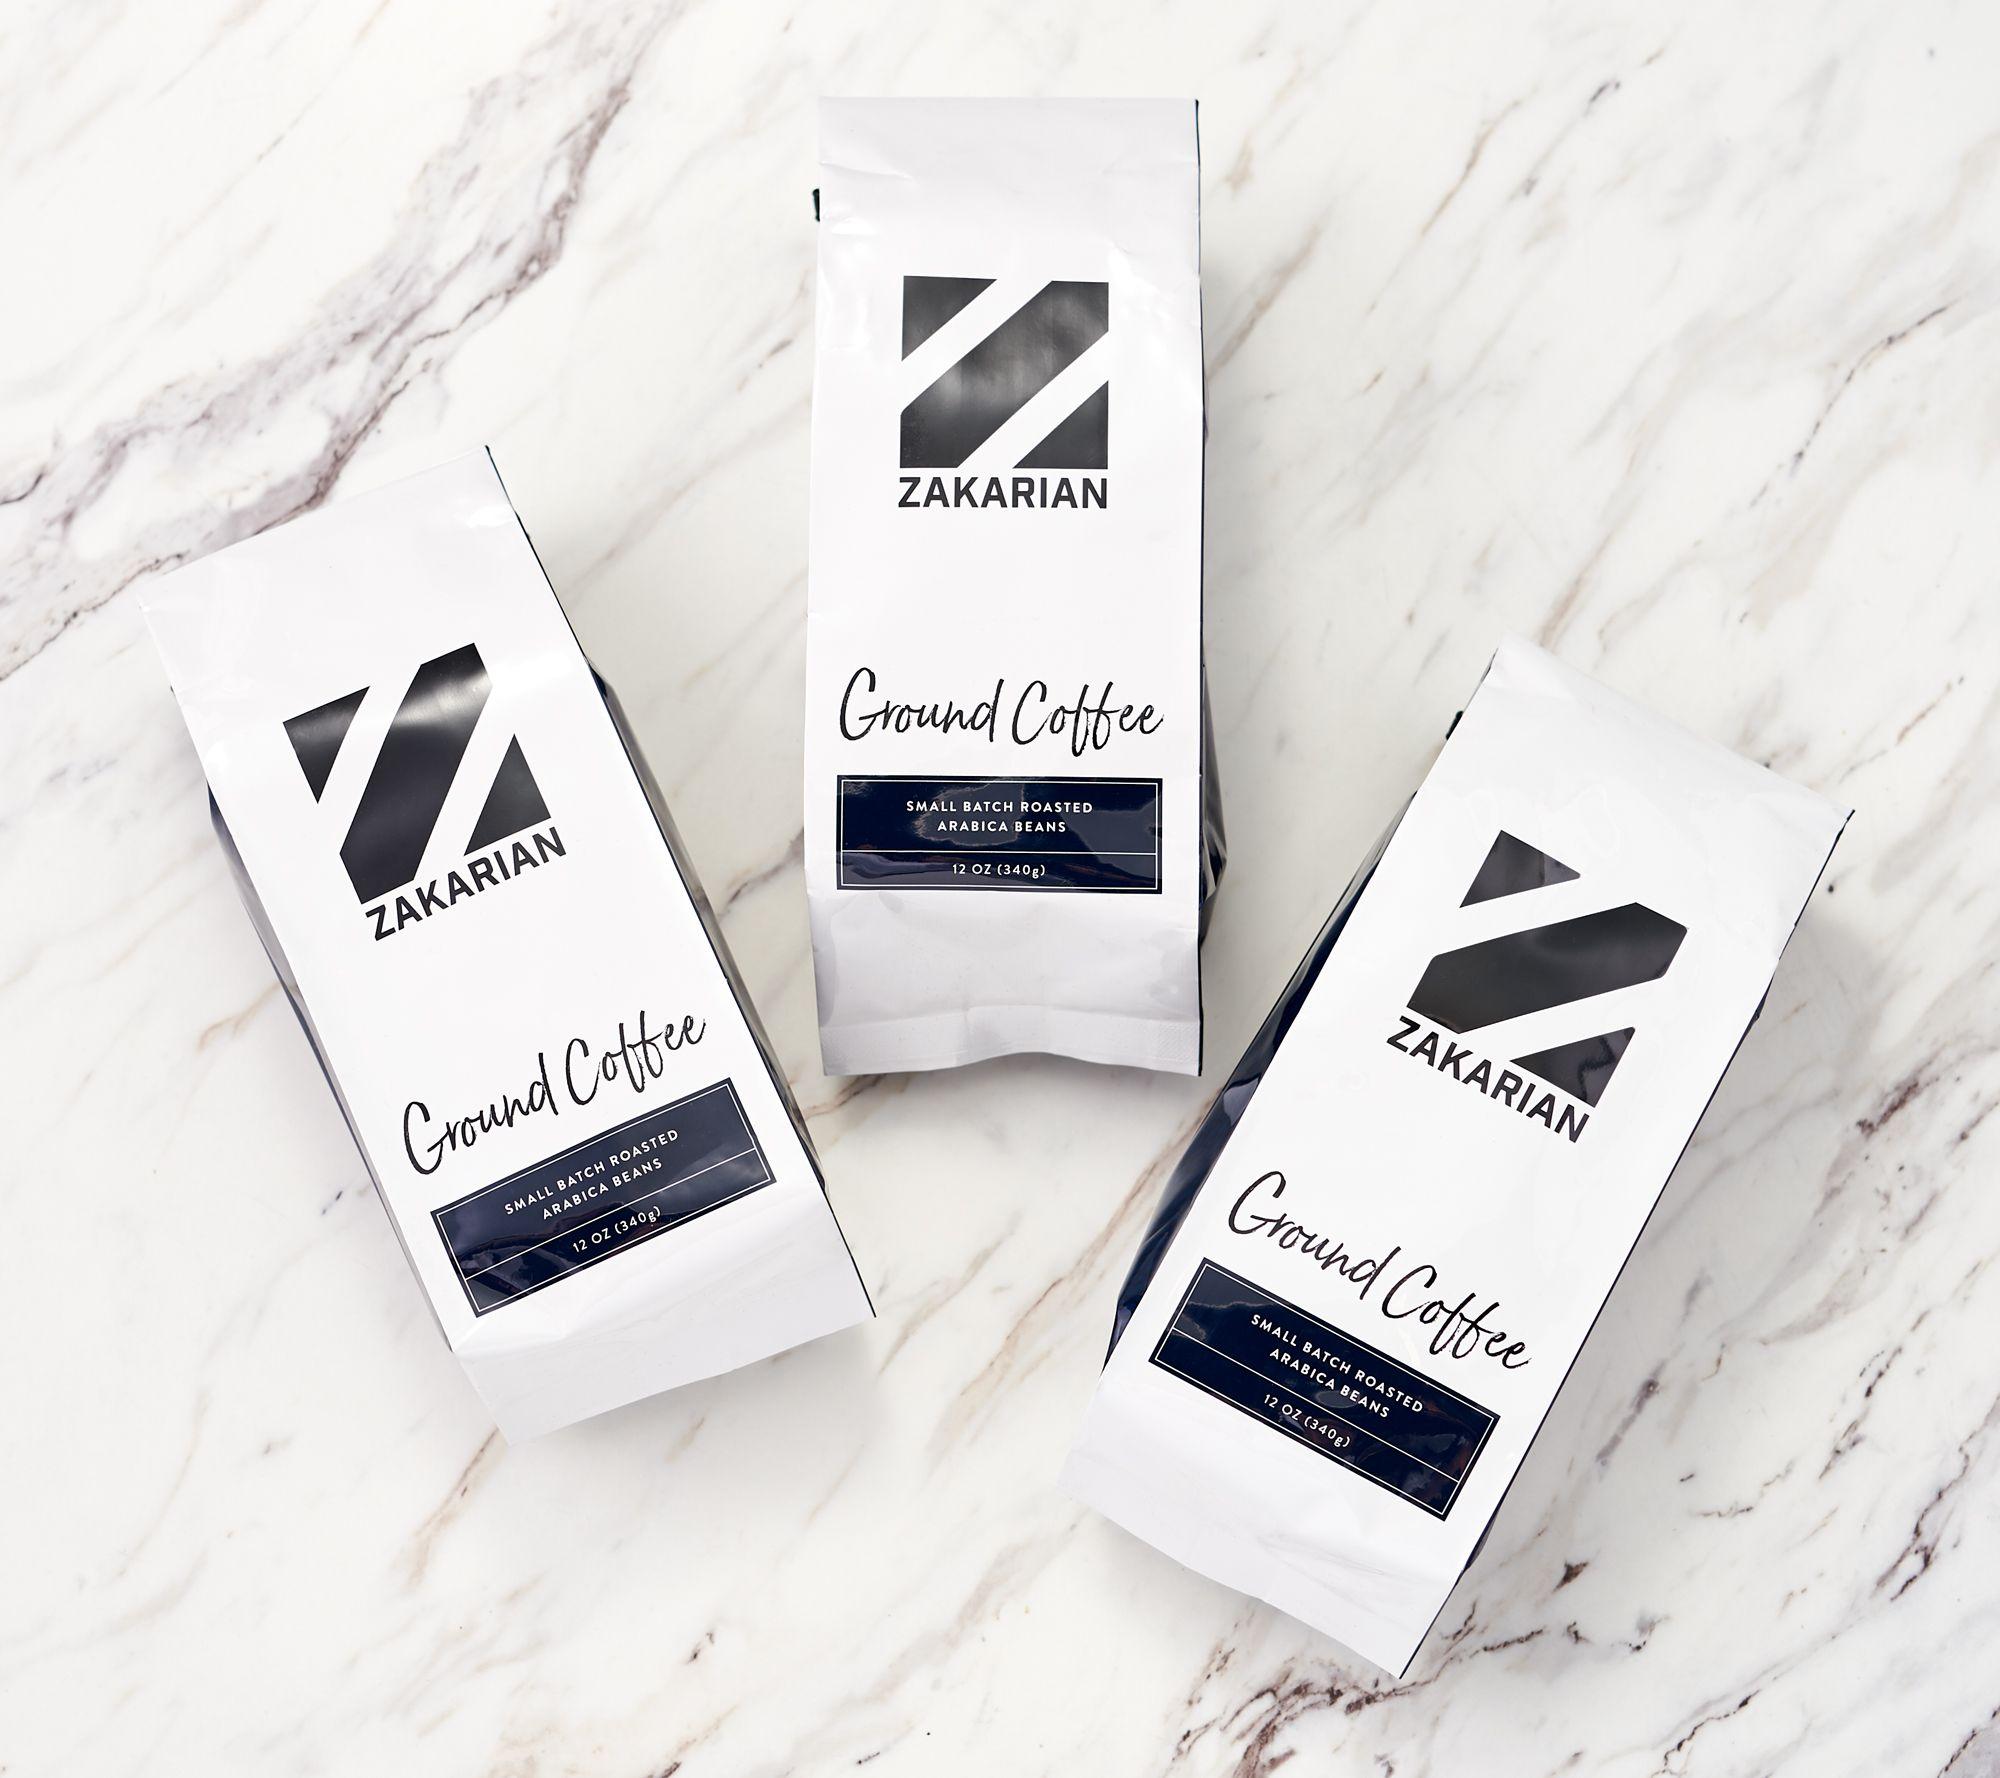 3-Pack Geoffrey Zakarian Arabica Coffee 12-oz Bag